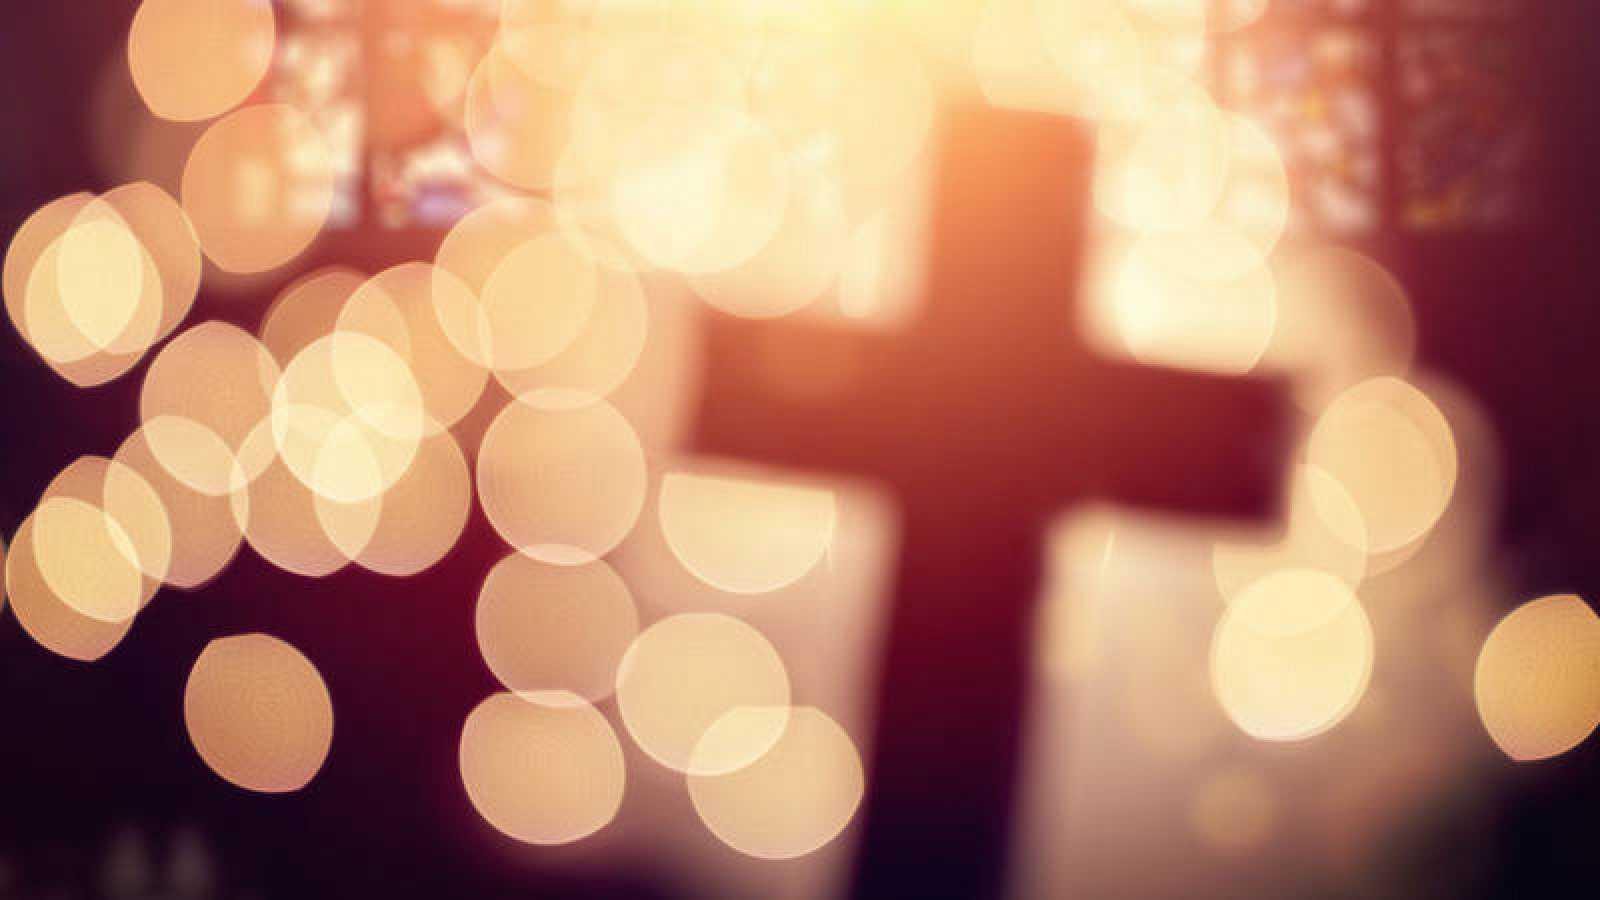 Una cruz cristiana en el interior de una iglesia